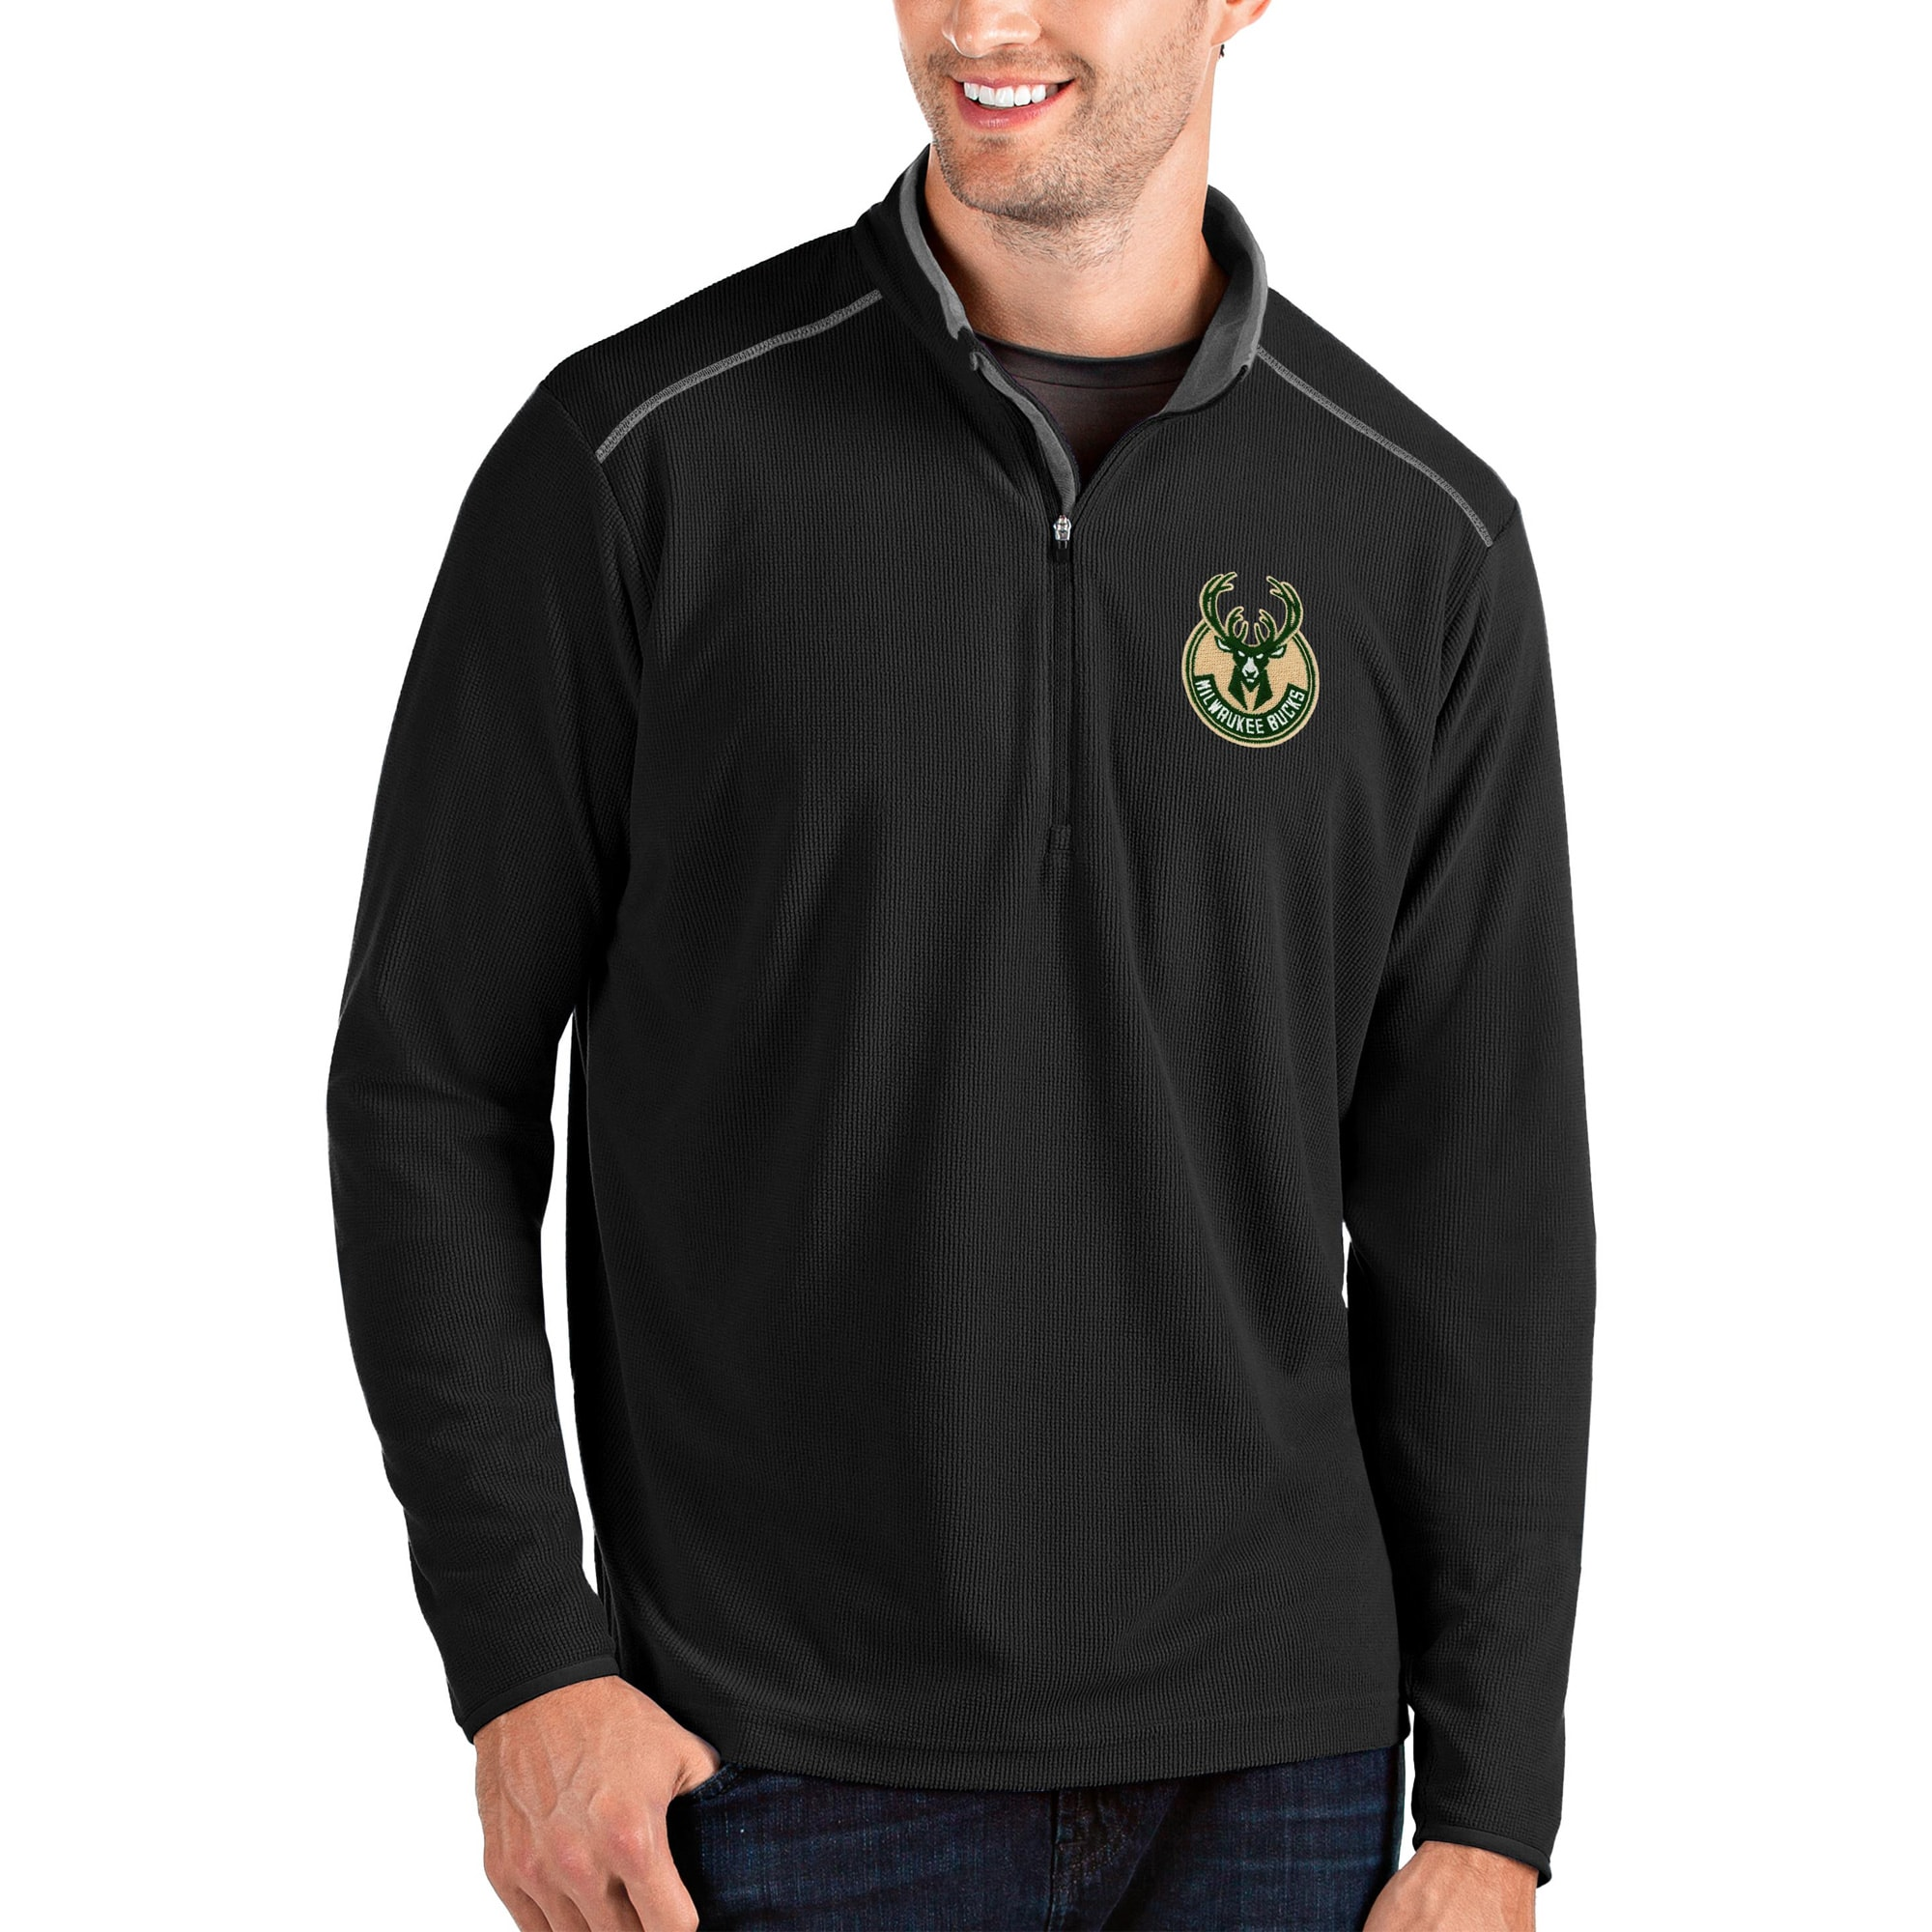 Milwaukee Bucks Antigua Glacier Quarter-Zip Pullover Jacket - Black/Gray